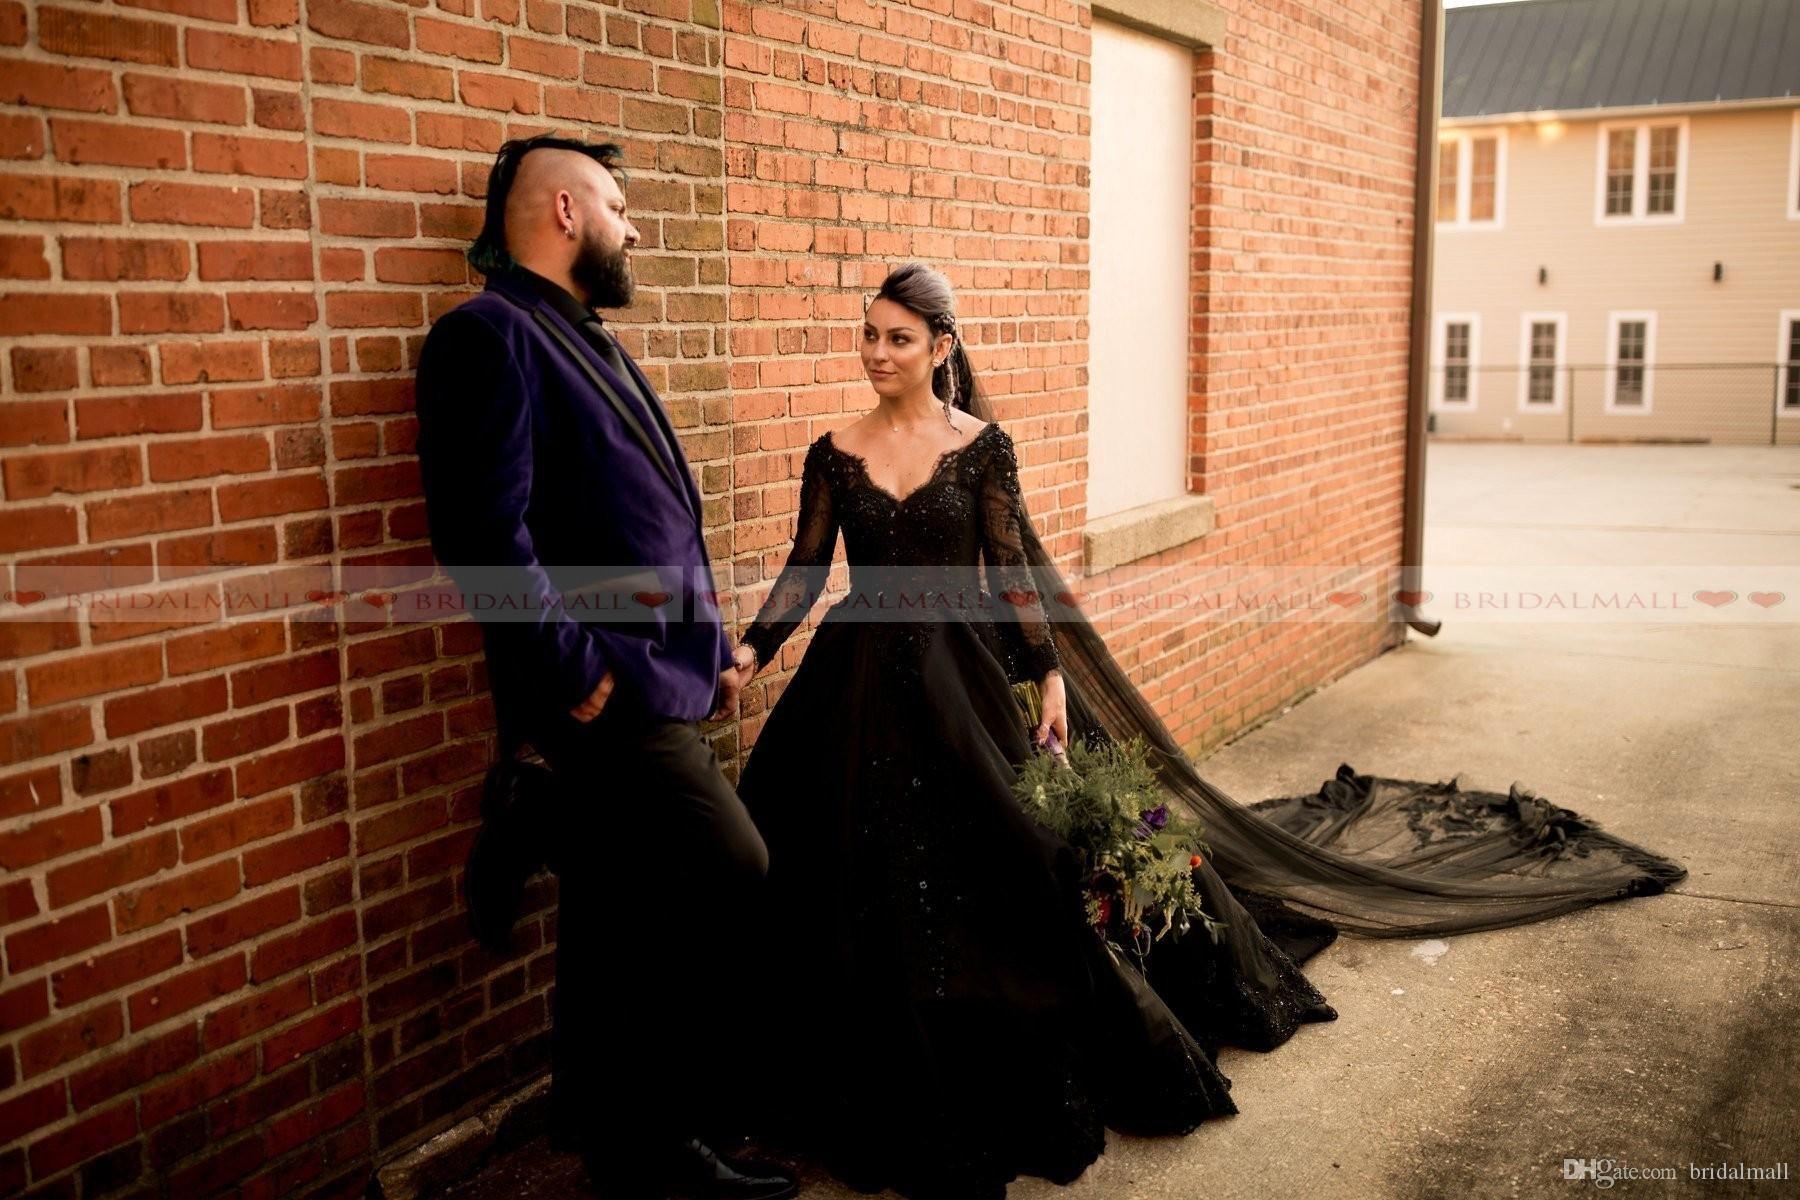 Discount Plus Size 2019 V Neck Black Lace Ball Gown Wedding Dresses Beaded Applique Sheer Long Sle Black Ball Gown Ball Gown Wedding Dress Gothic Wedding Dress [ 1200 x 1800 Pixel ]